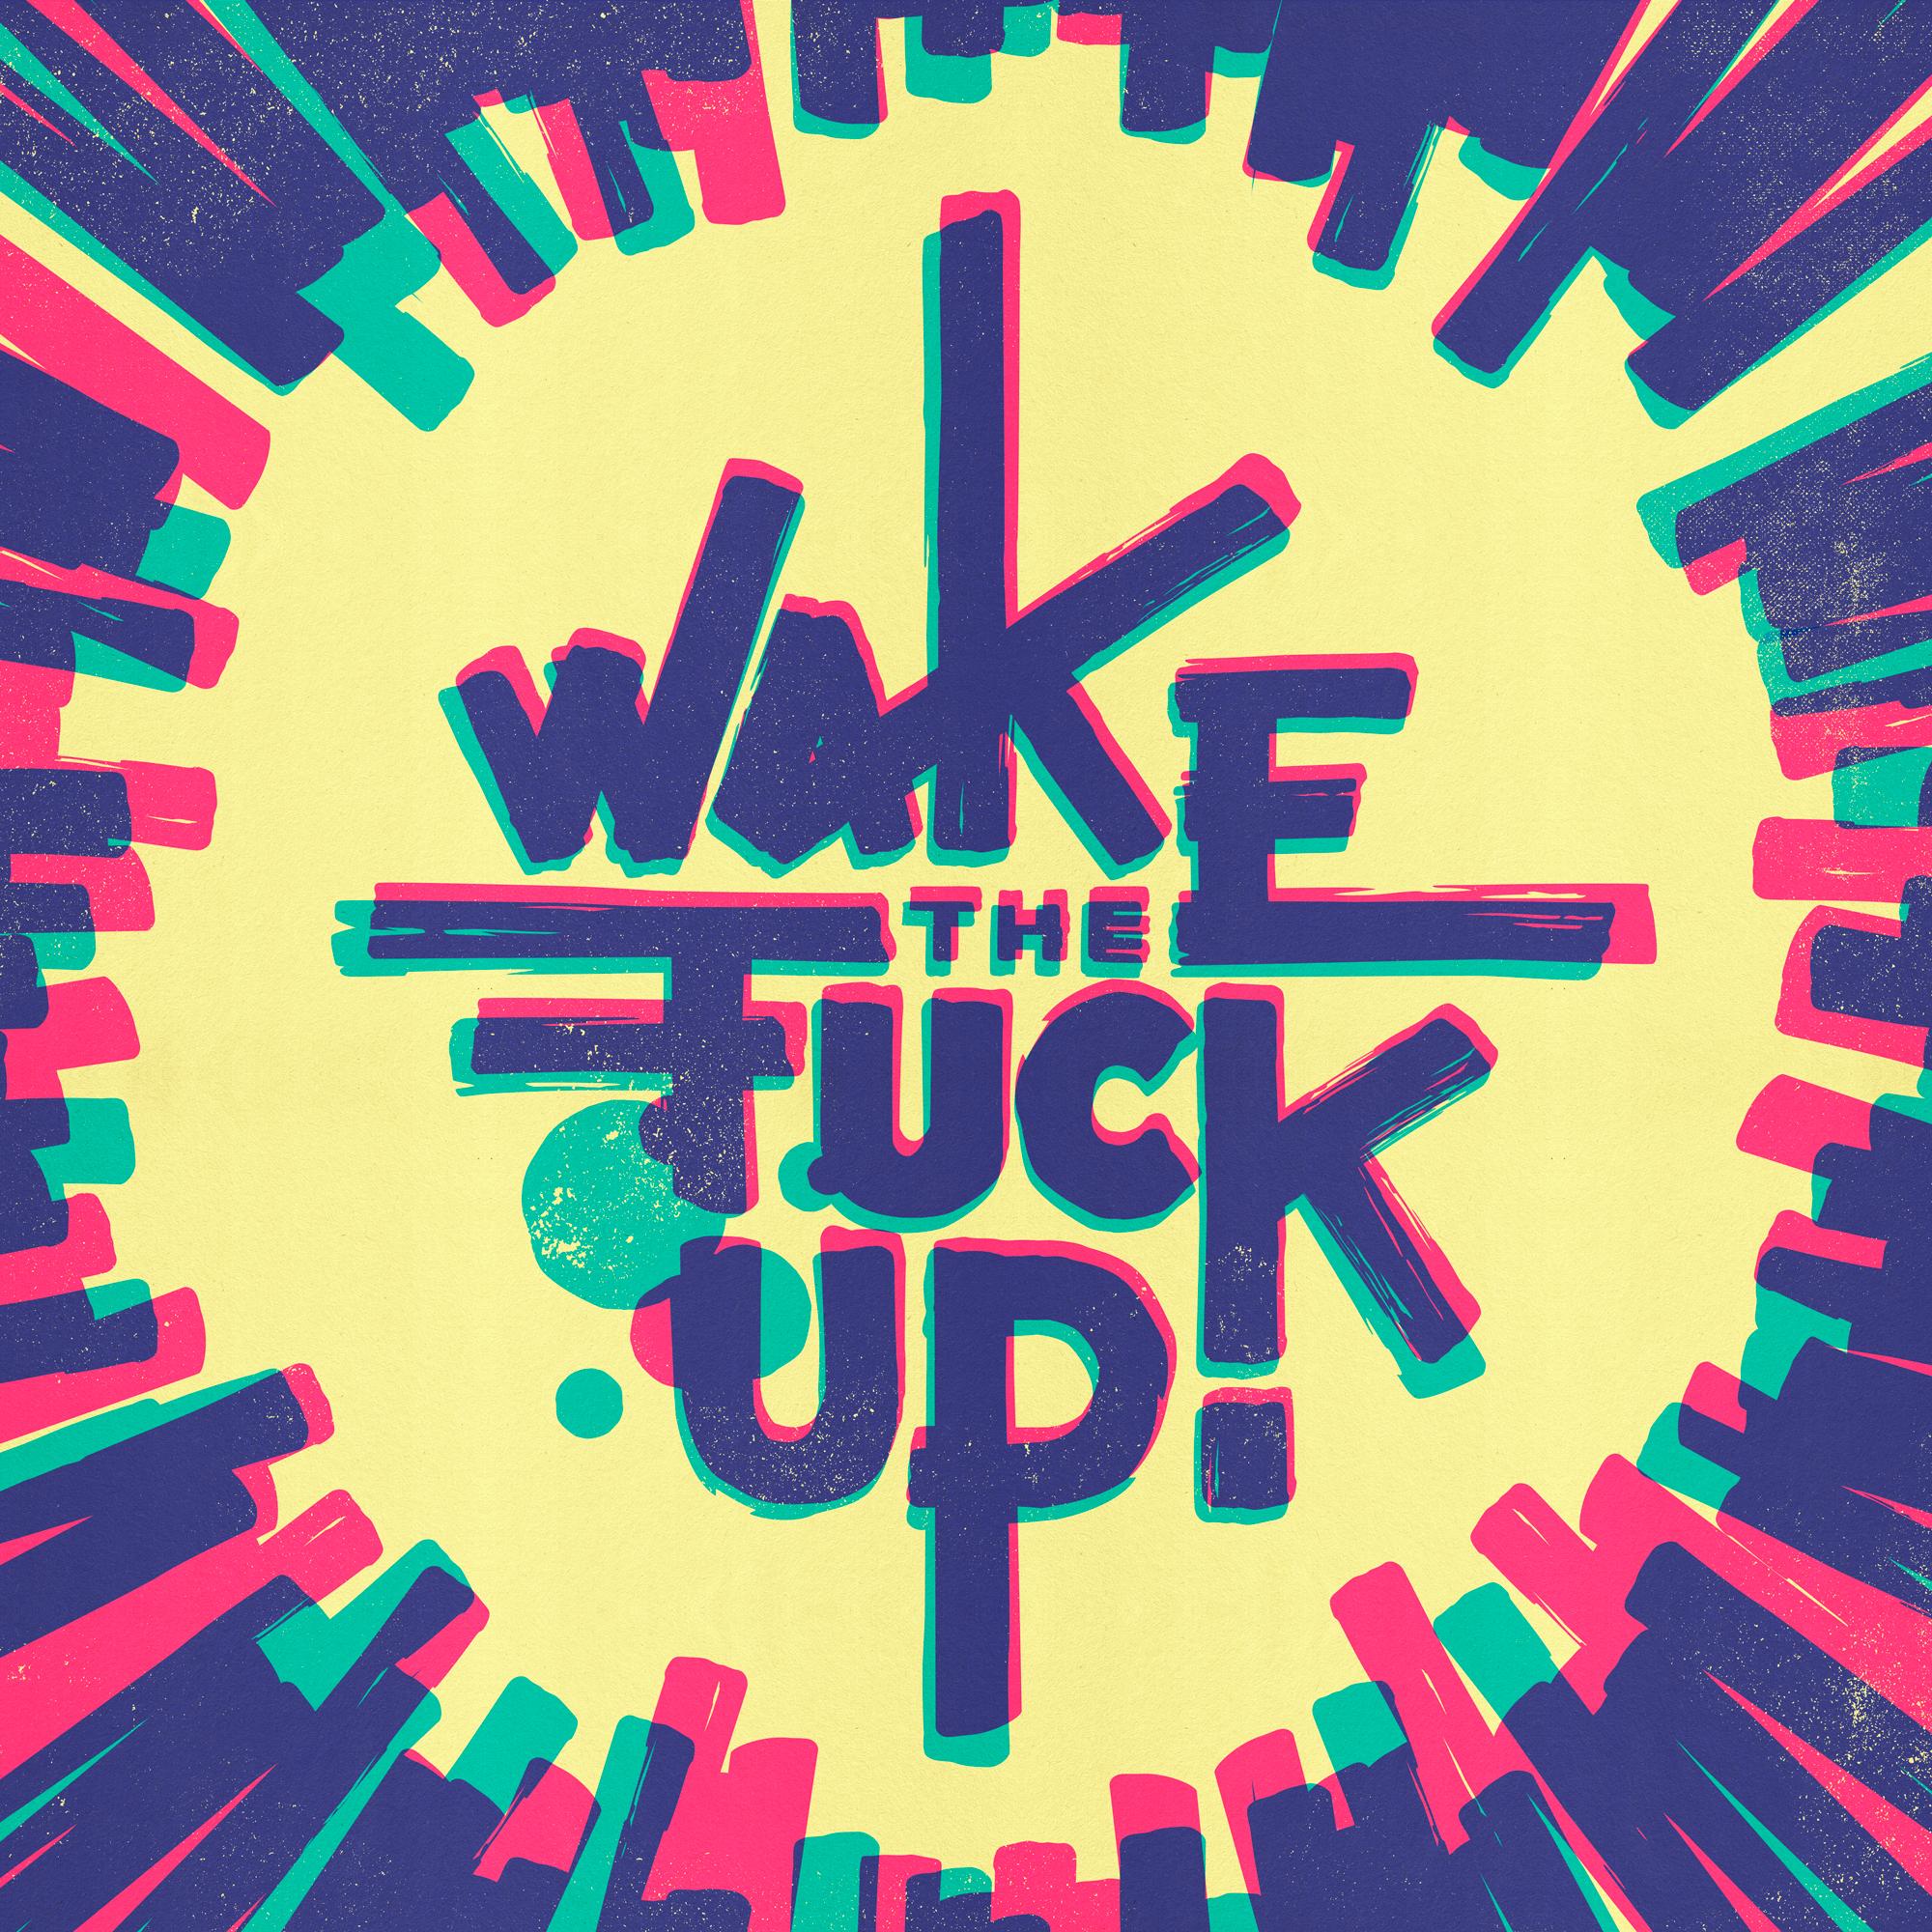 Wake the fuck up!